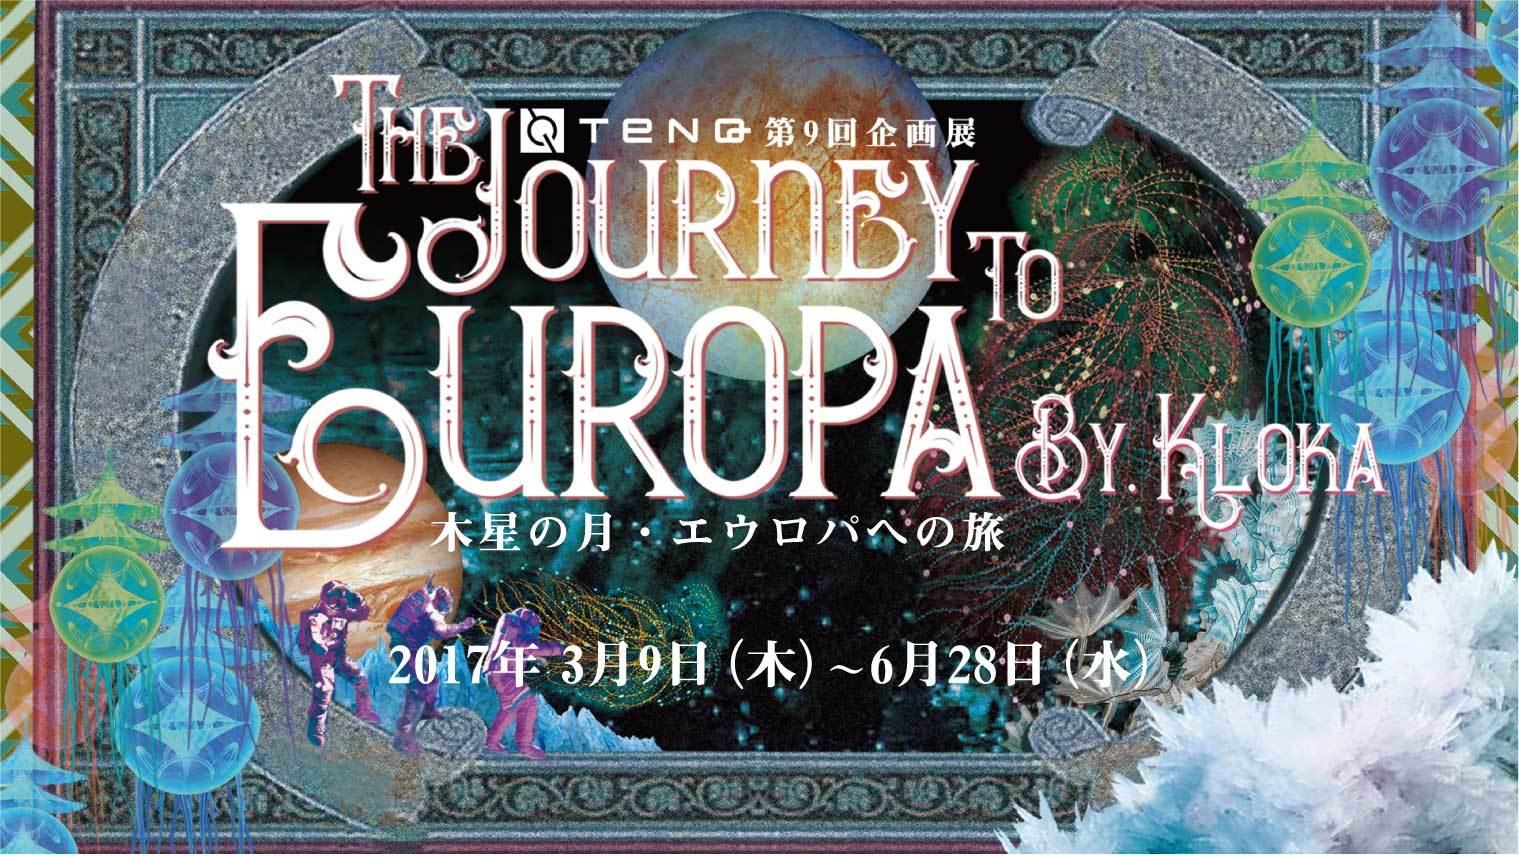 『The Journey to EUROPA by KLOKA~木星の月・エウロパへの旅~』